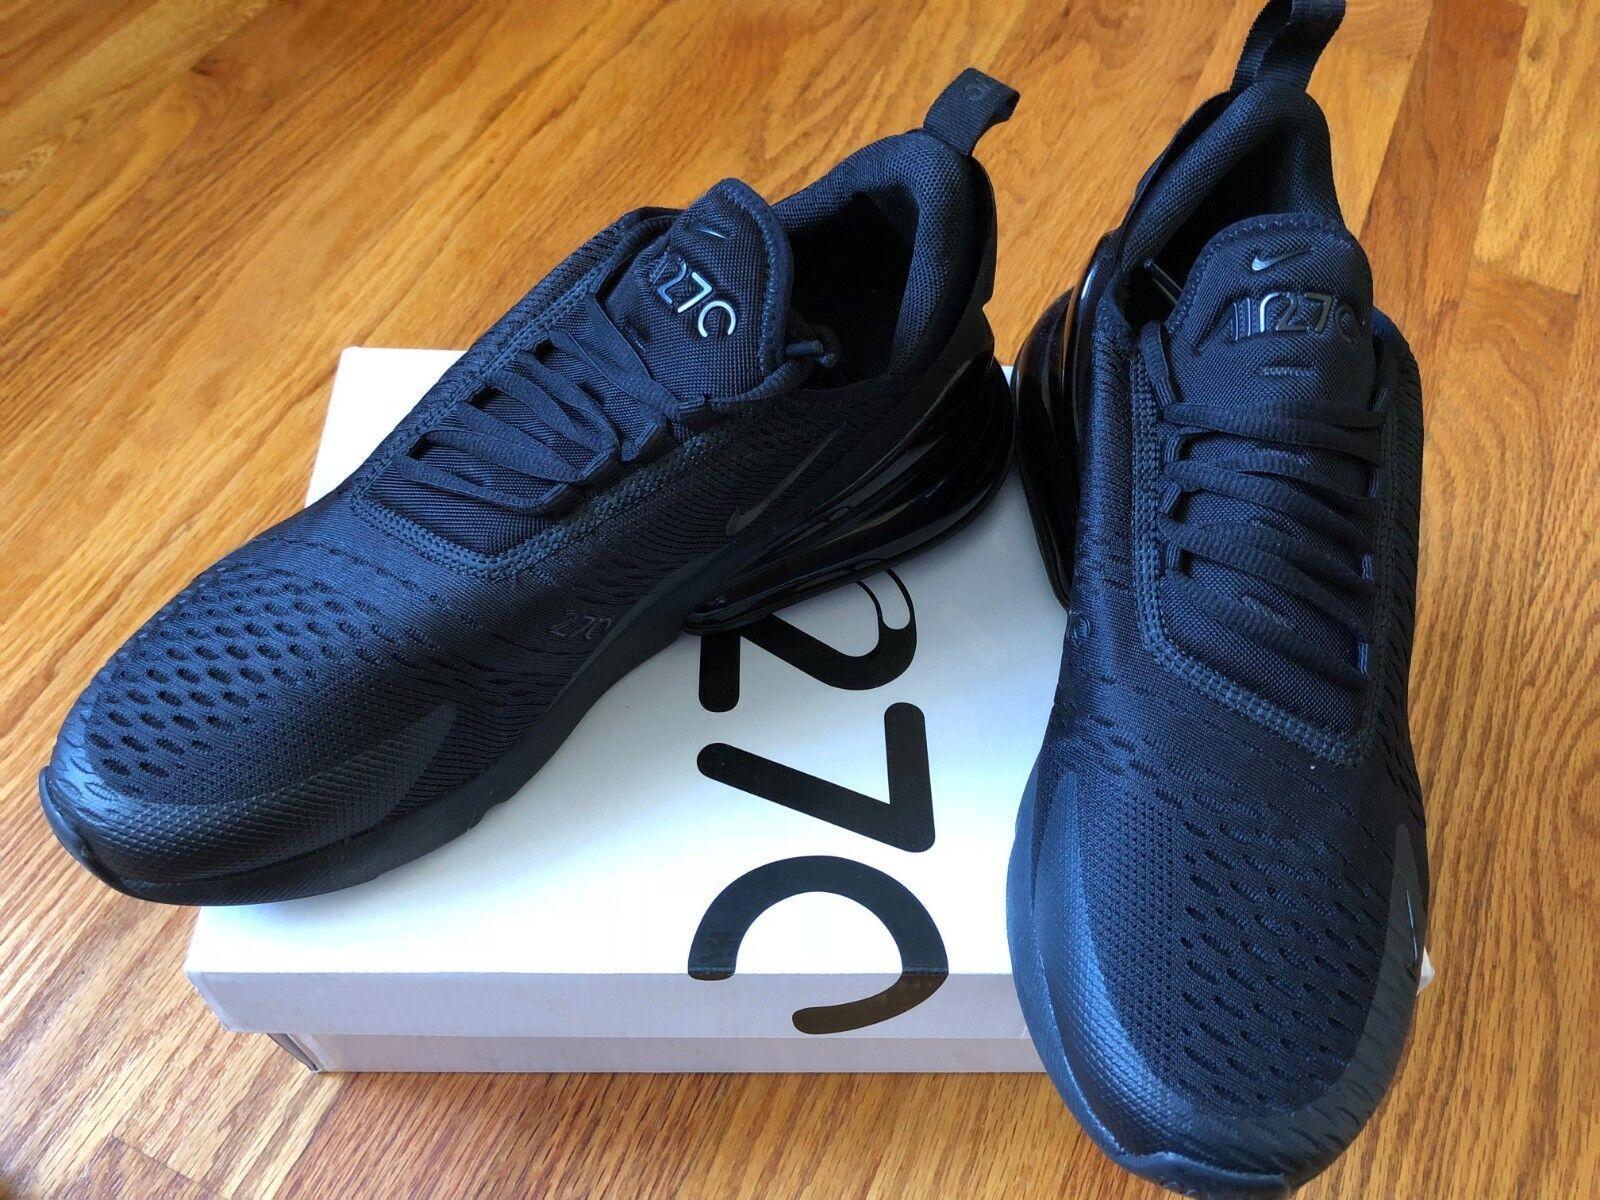 66b602235d Nike Air Max 270 Mens Ah8050-005 Triple Triple Triple Black Mesh Knit  Running Shoes